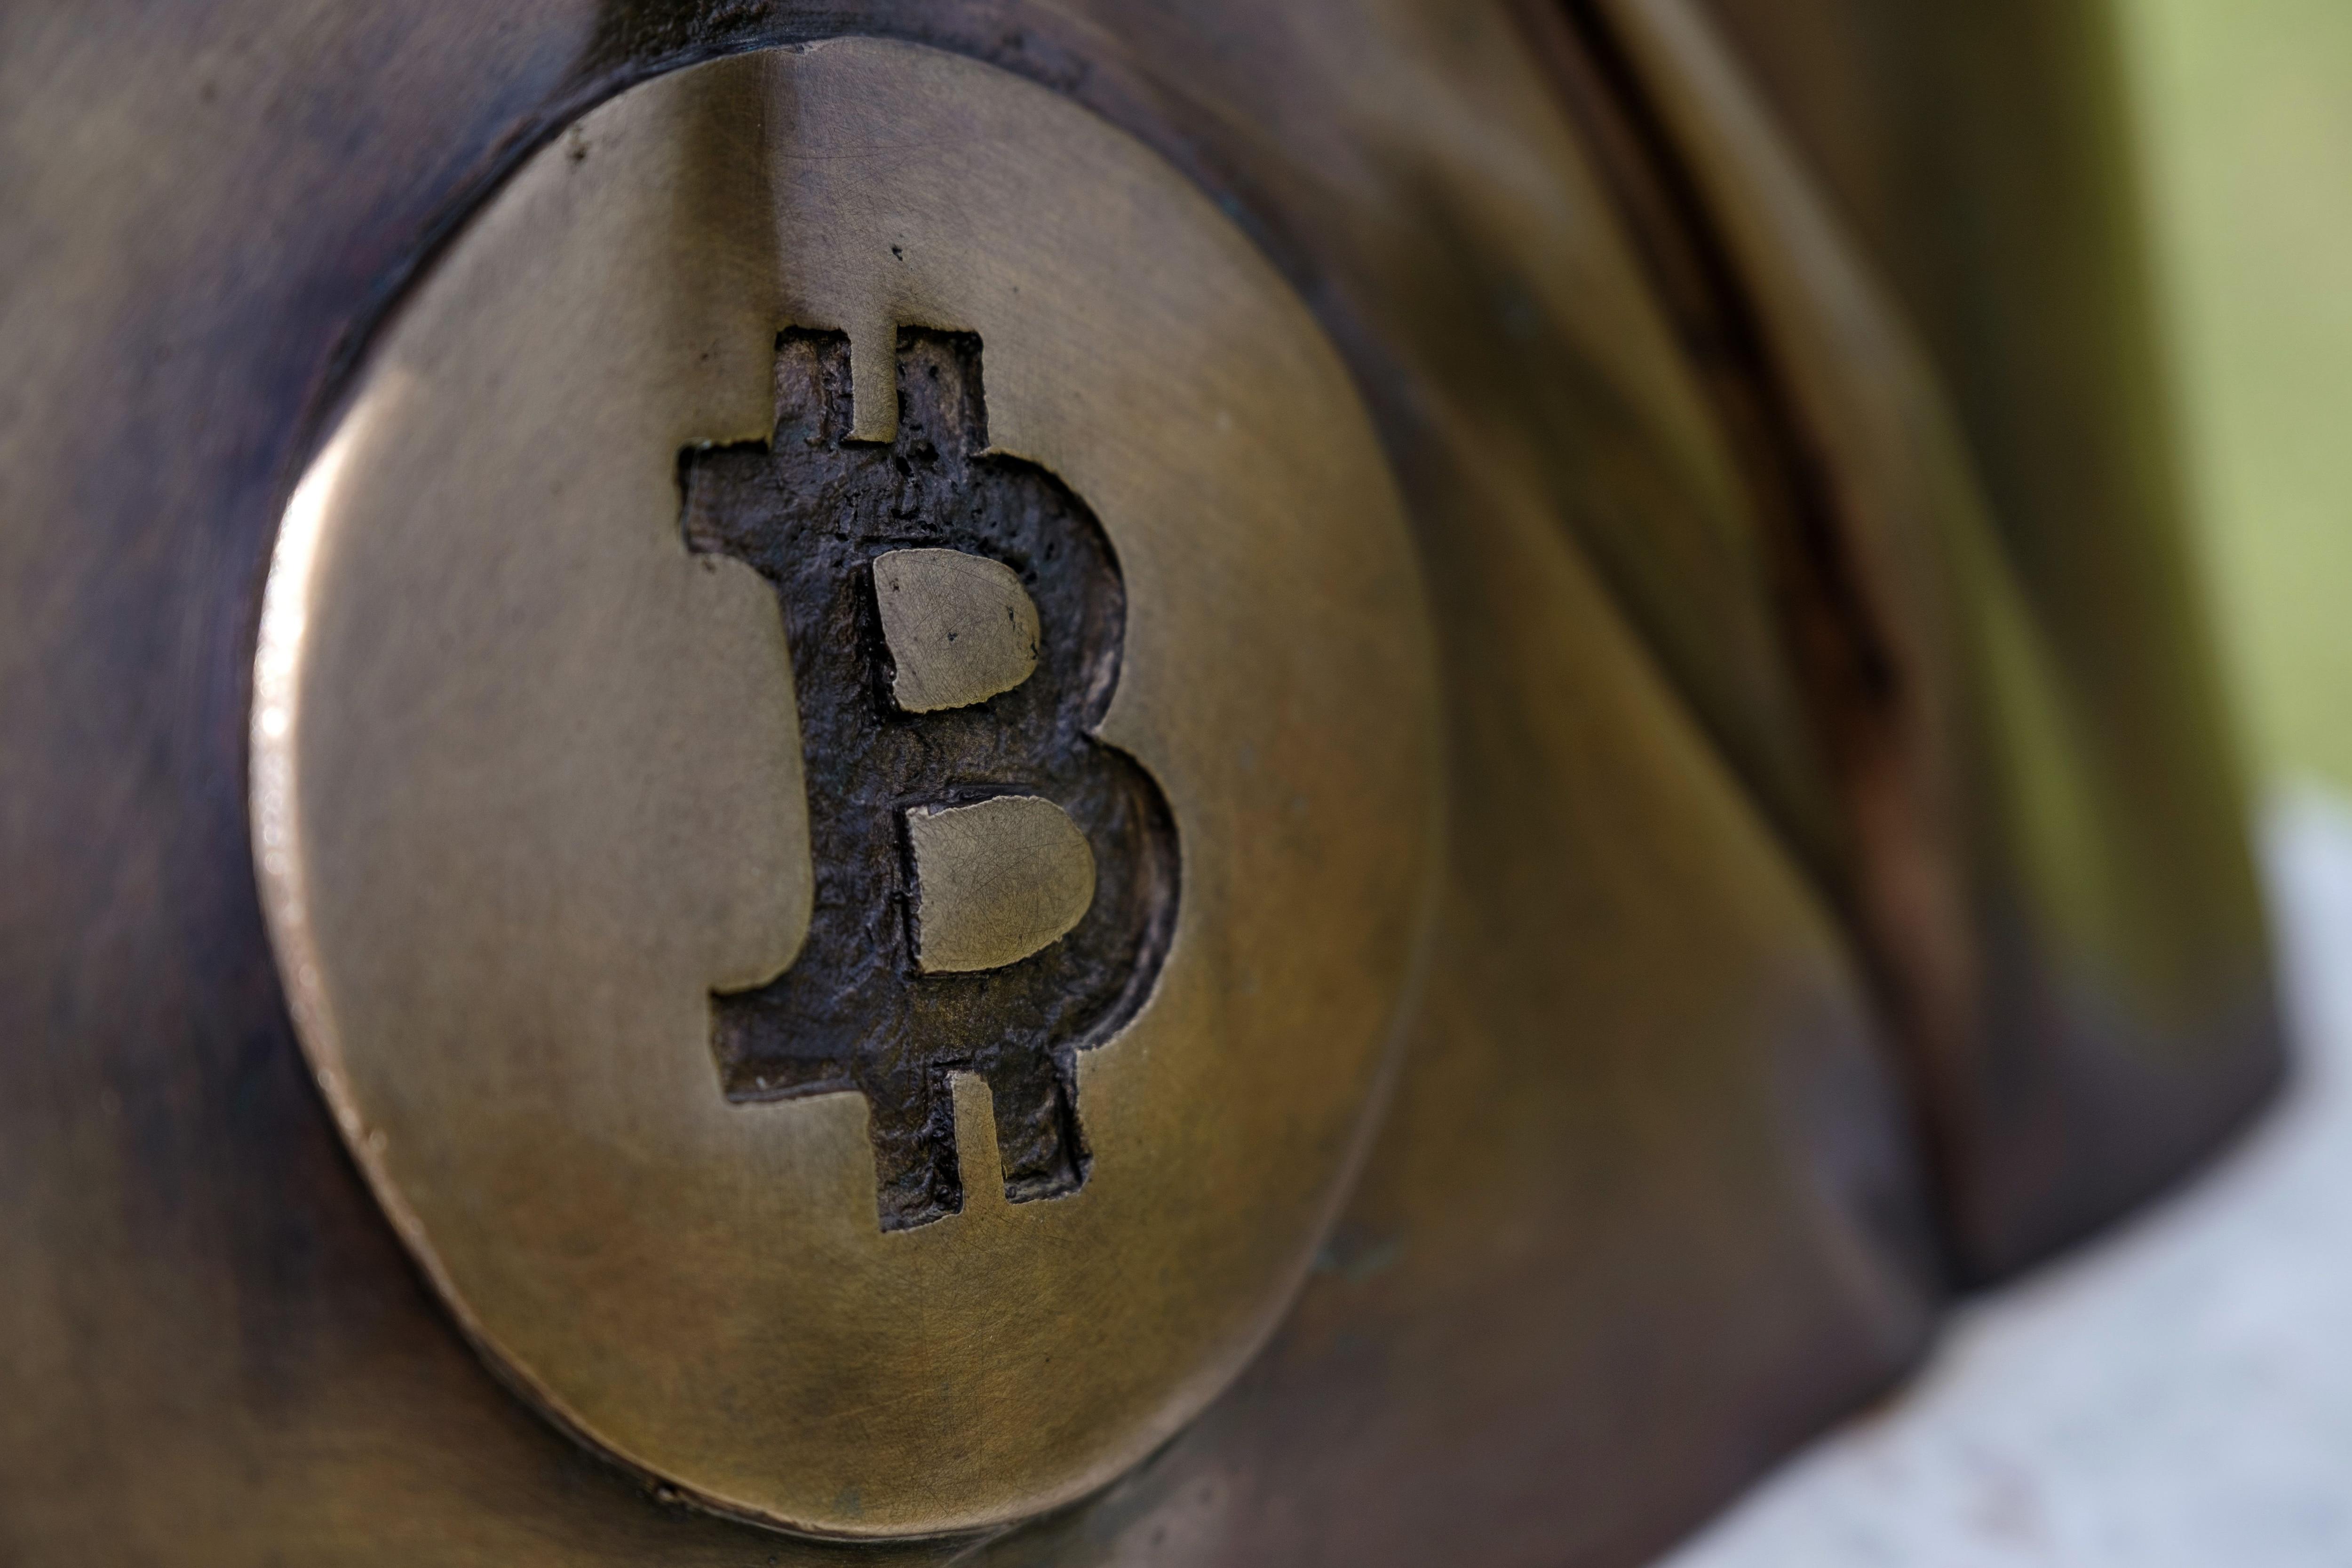 China's Latest Crypto Crackdown Draws Yawns From Bitcoin Market Vets